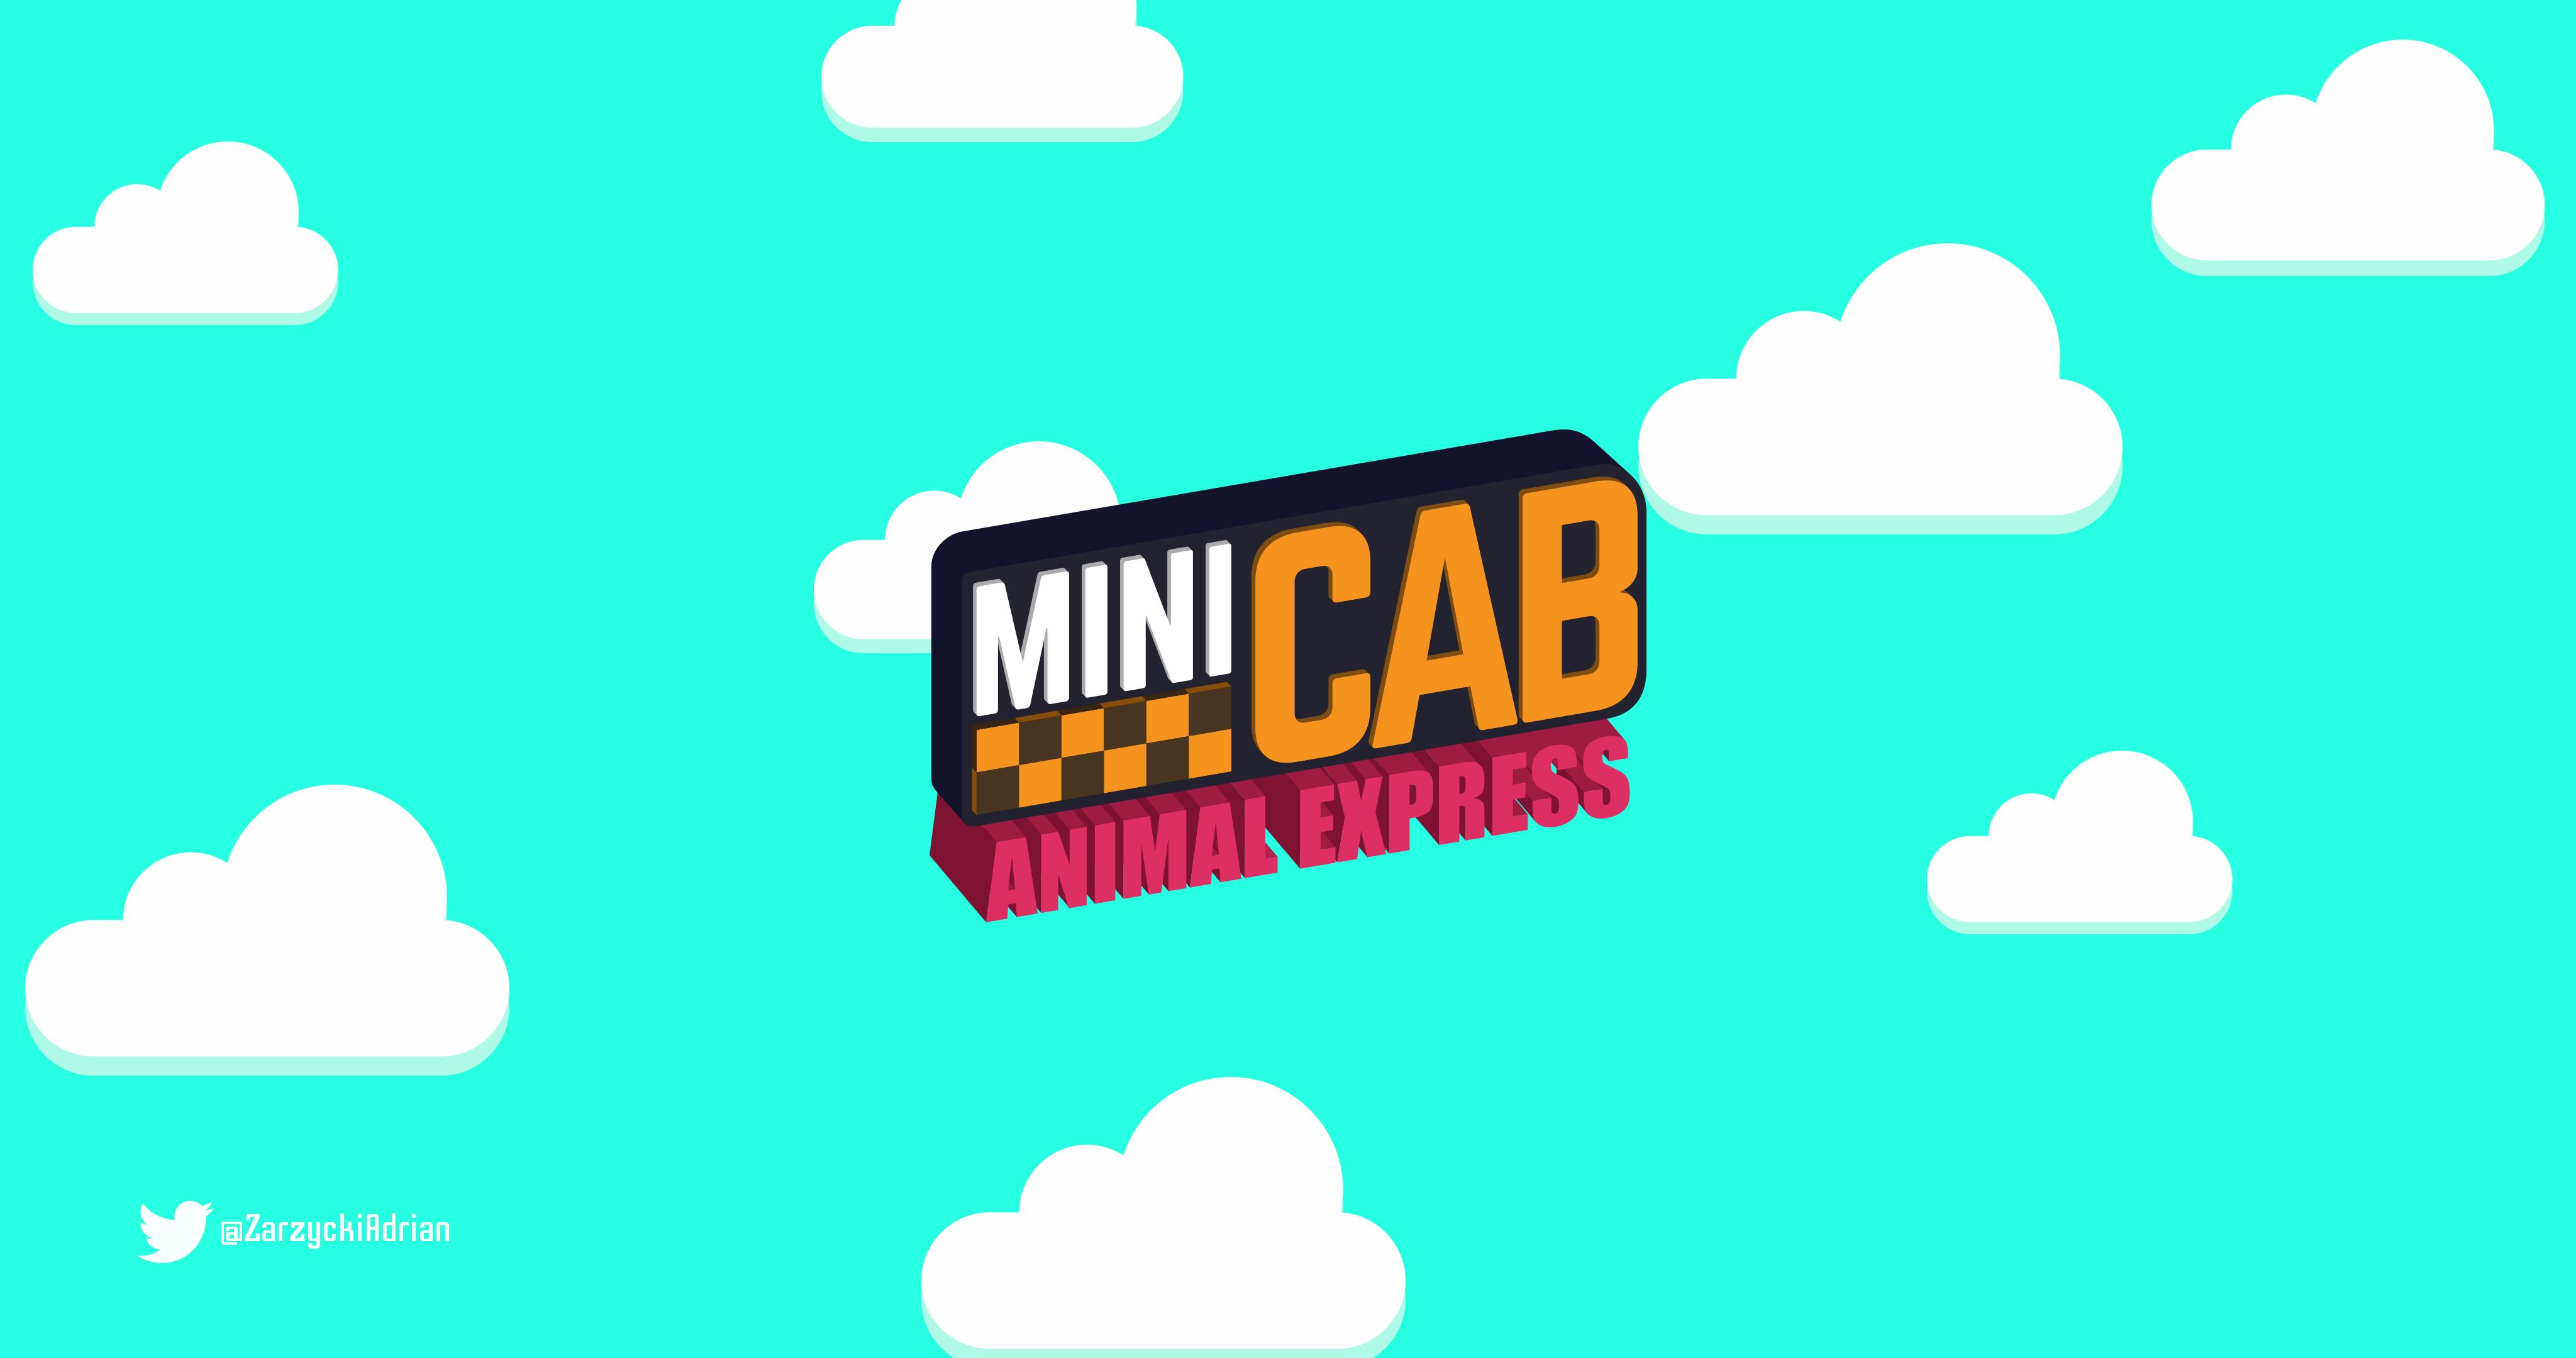 MiniCab: Animal Express